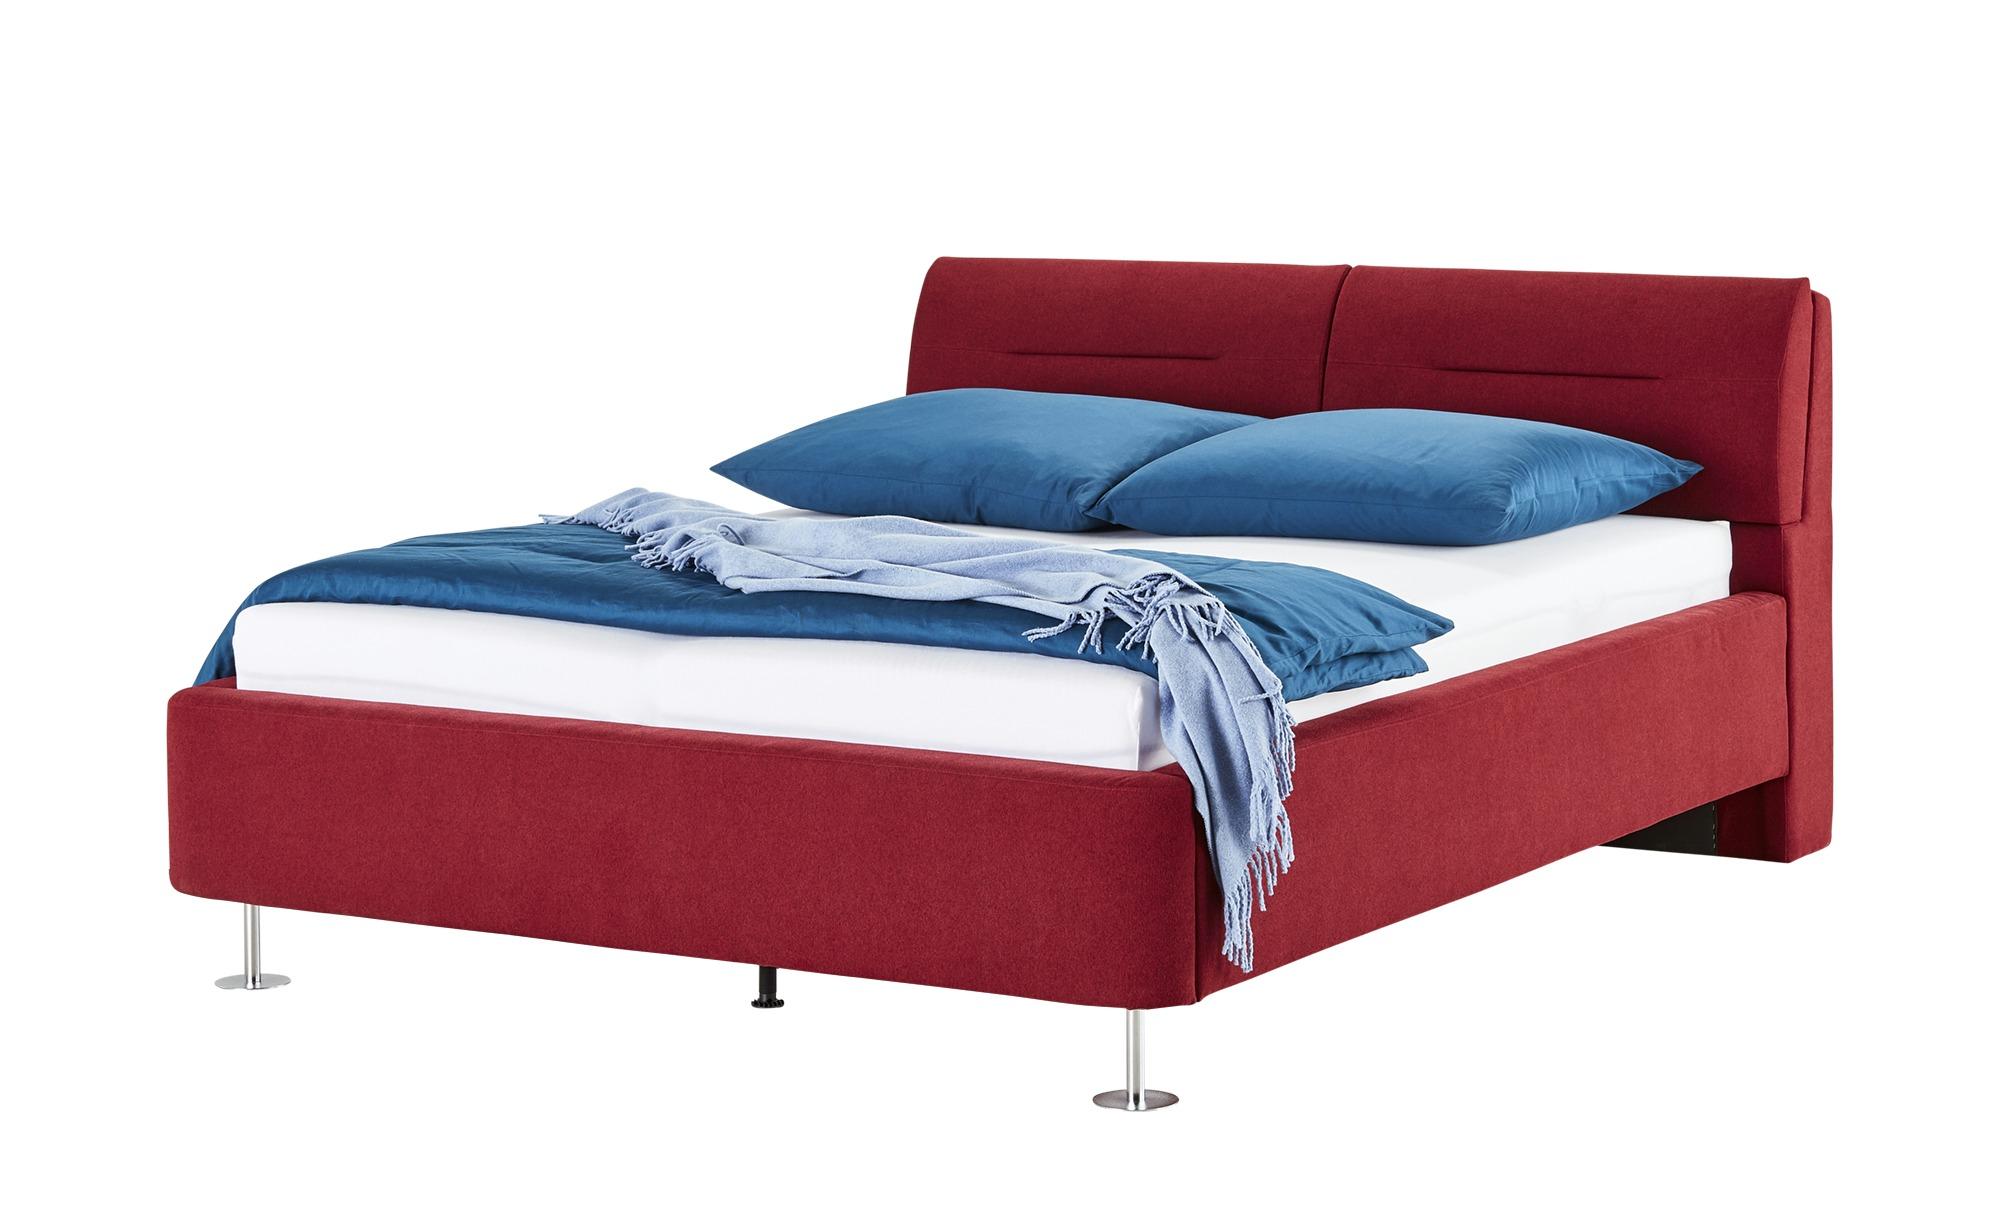 Full Size of Polsterbettgestell 160x200 Rot Mein Bett Hffner Amerikanische Betten Mit Bettkasten Ruf Outlet 140 Sofa Ausziehbar Lattenrost Und Matratze Hoch Günstige Bett 160x200 Bett